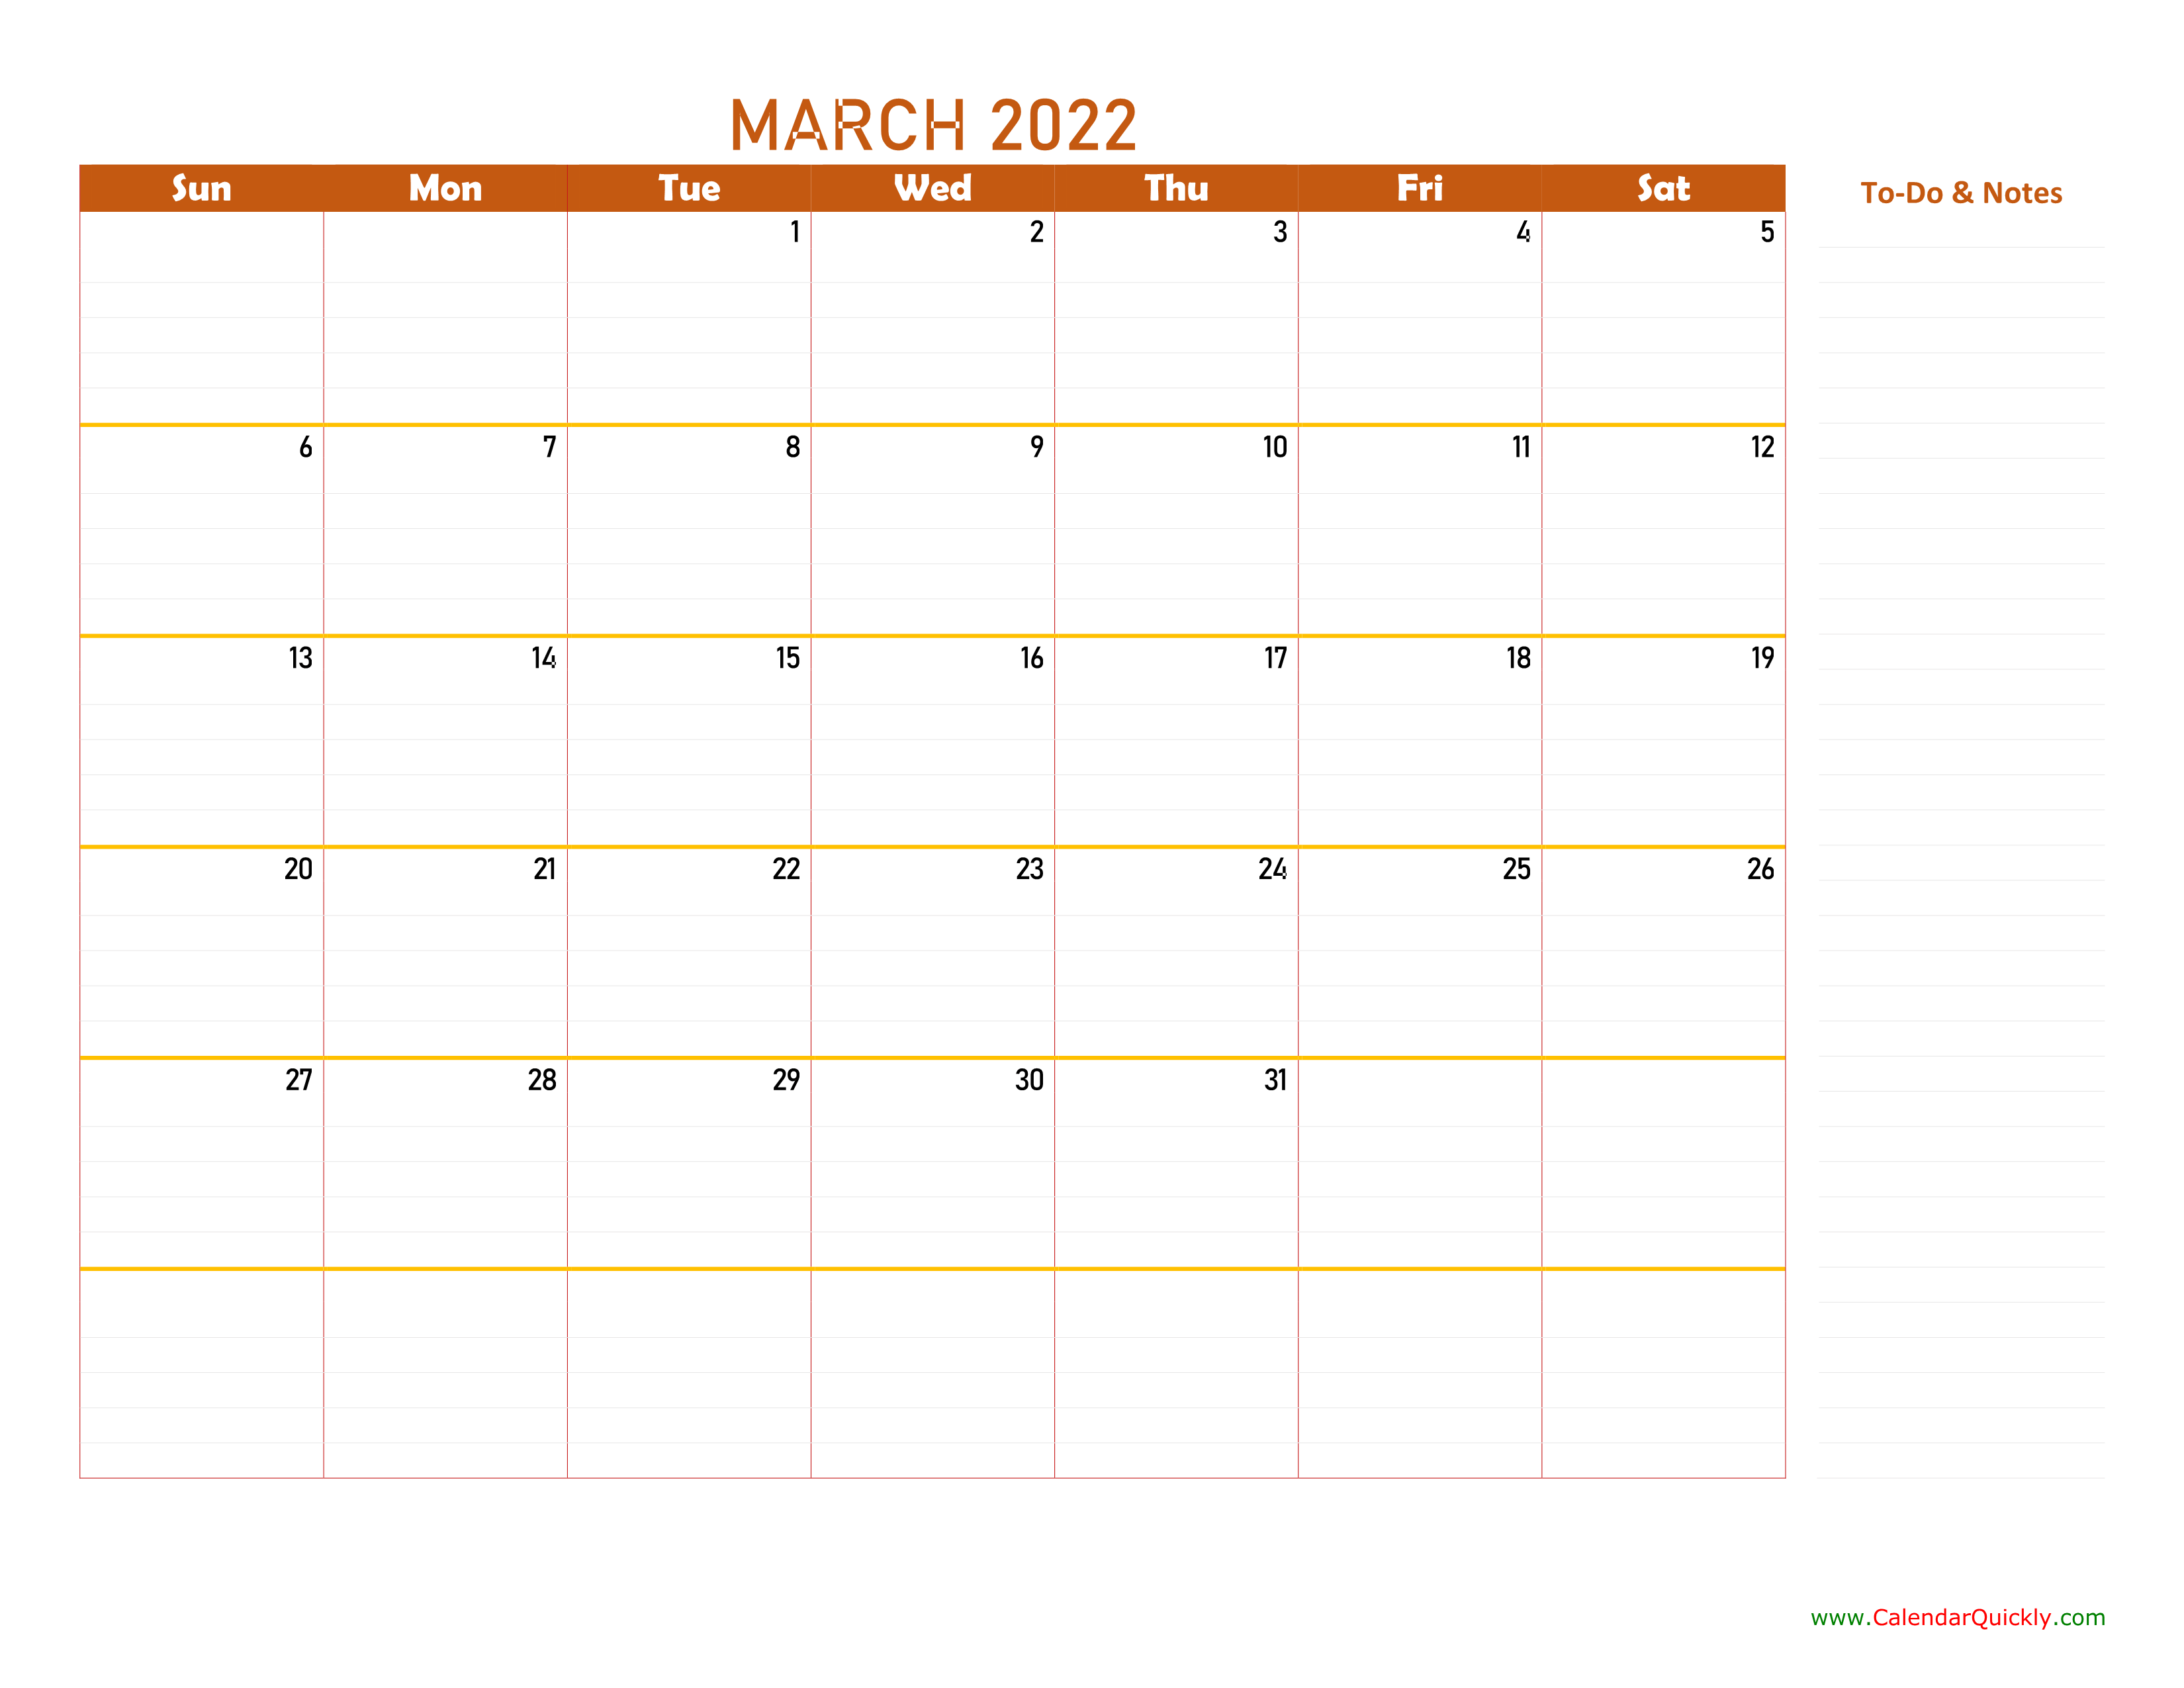 March 2022 Calendar   Calendar Quickly With Regard To February March Calendar 2022